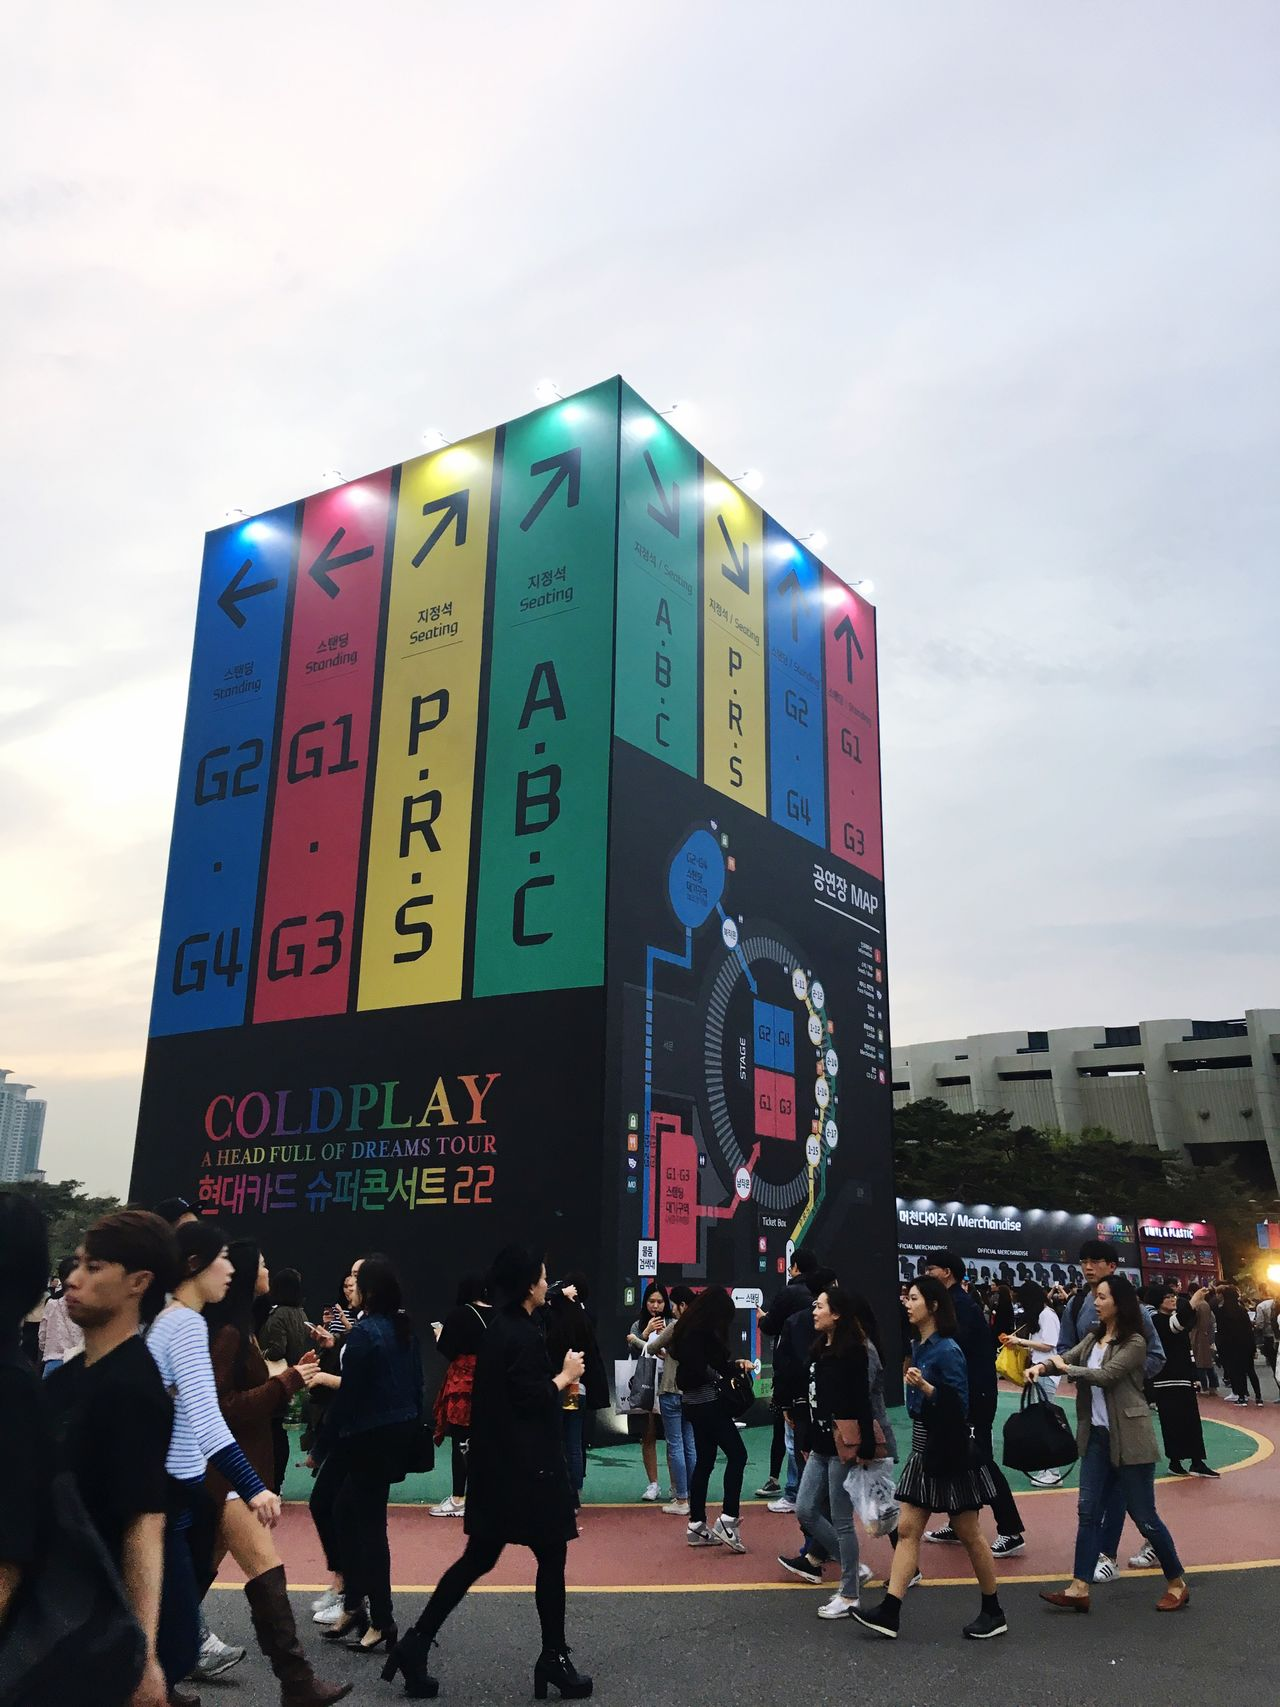 Coldplay concert. April. 2017. Seoul. S.Korea. Coldplay Coldplay Concert  COLDPLAY ♥ Concert